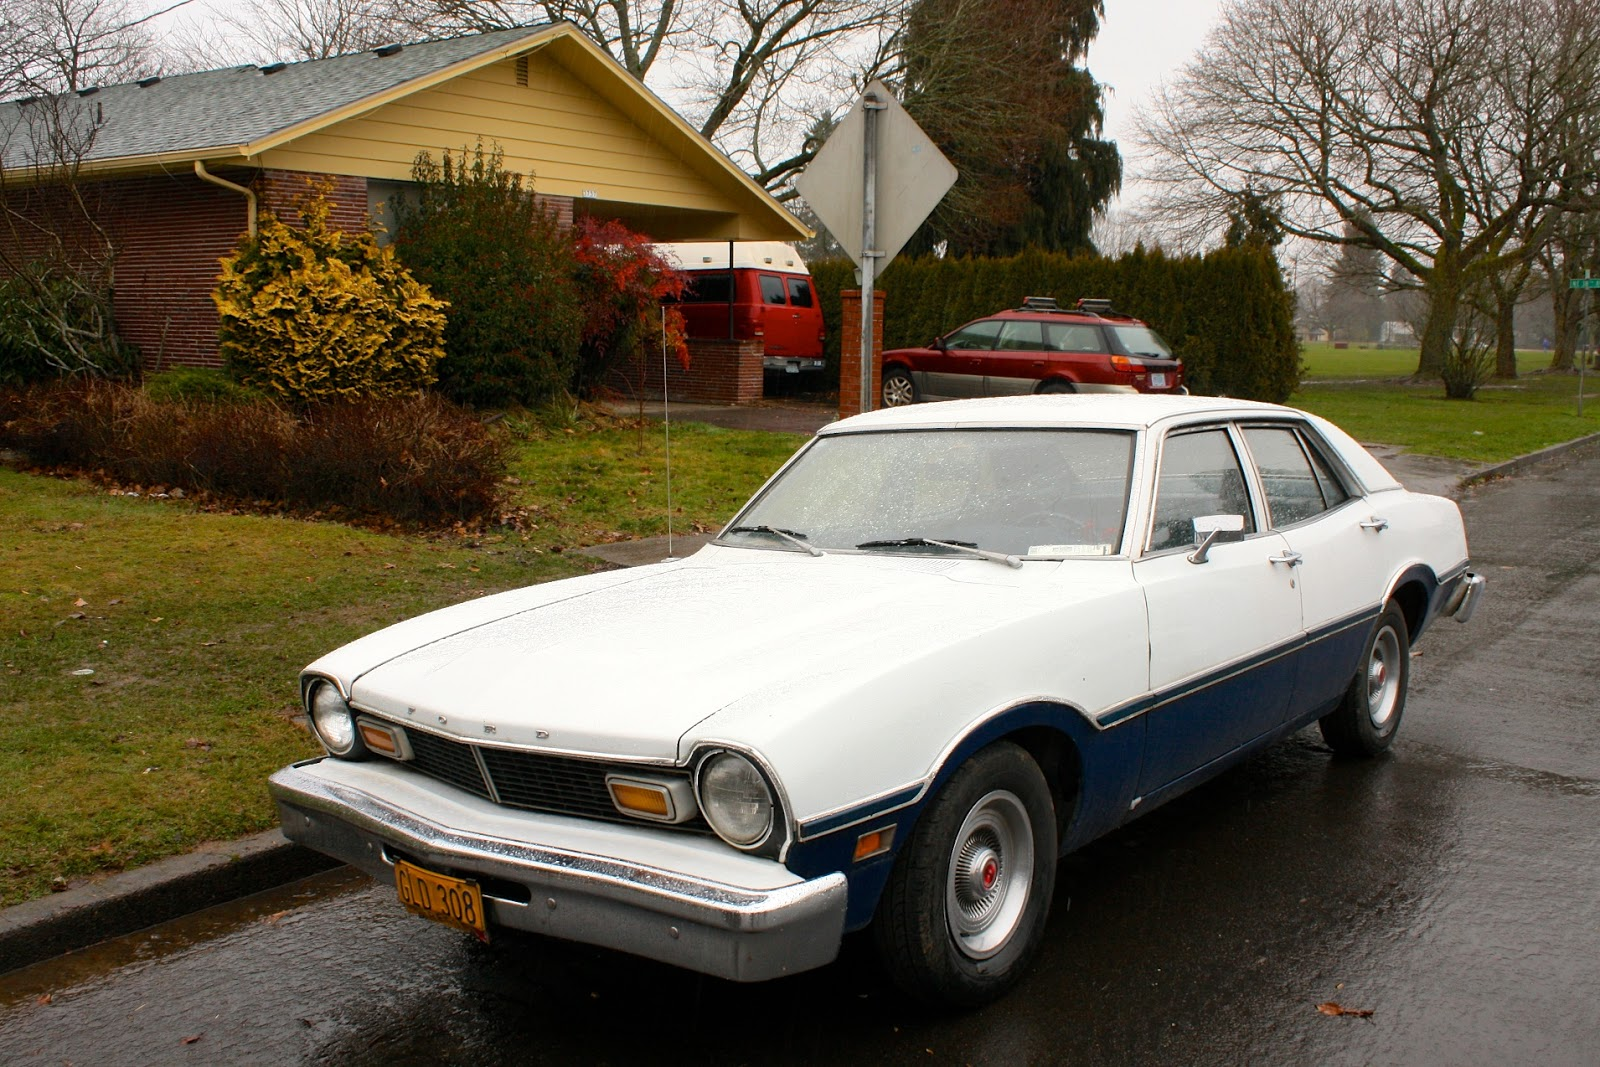 1976 Ford Maverick Sedan.